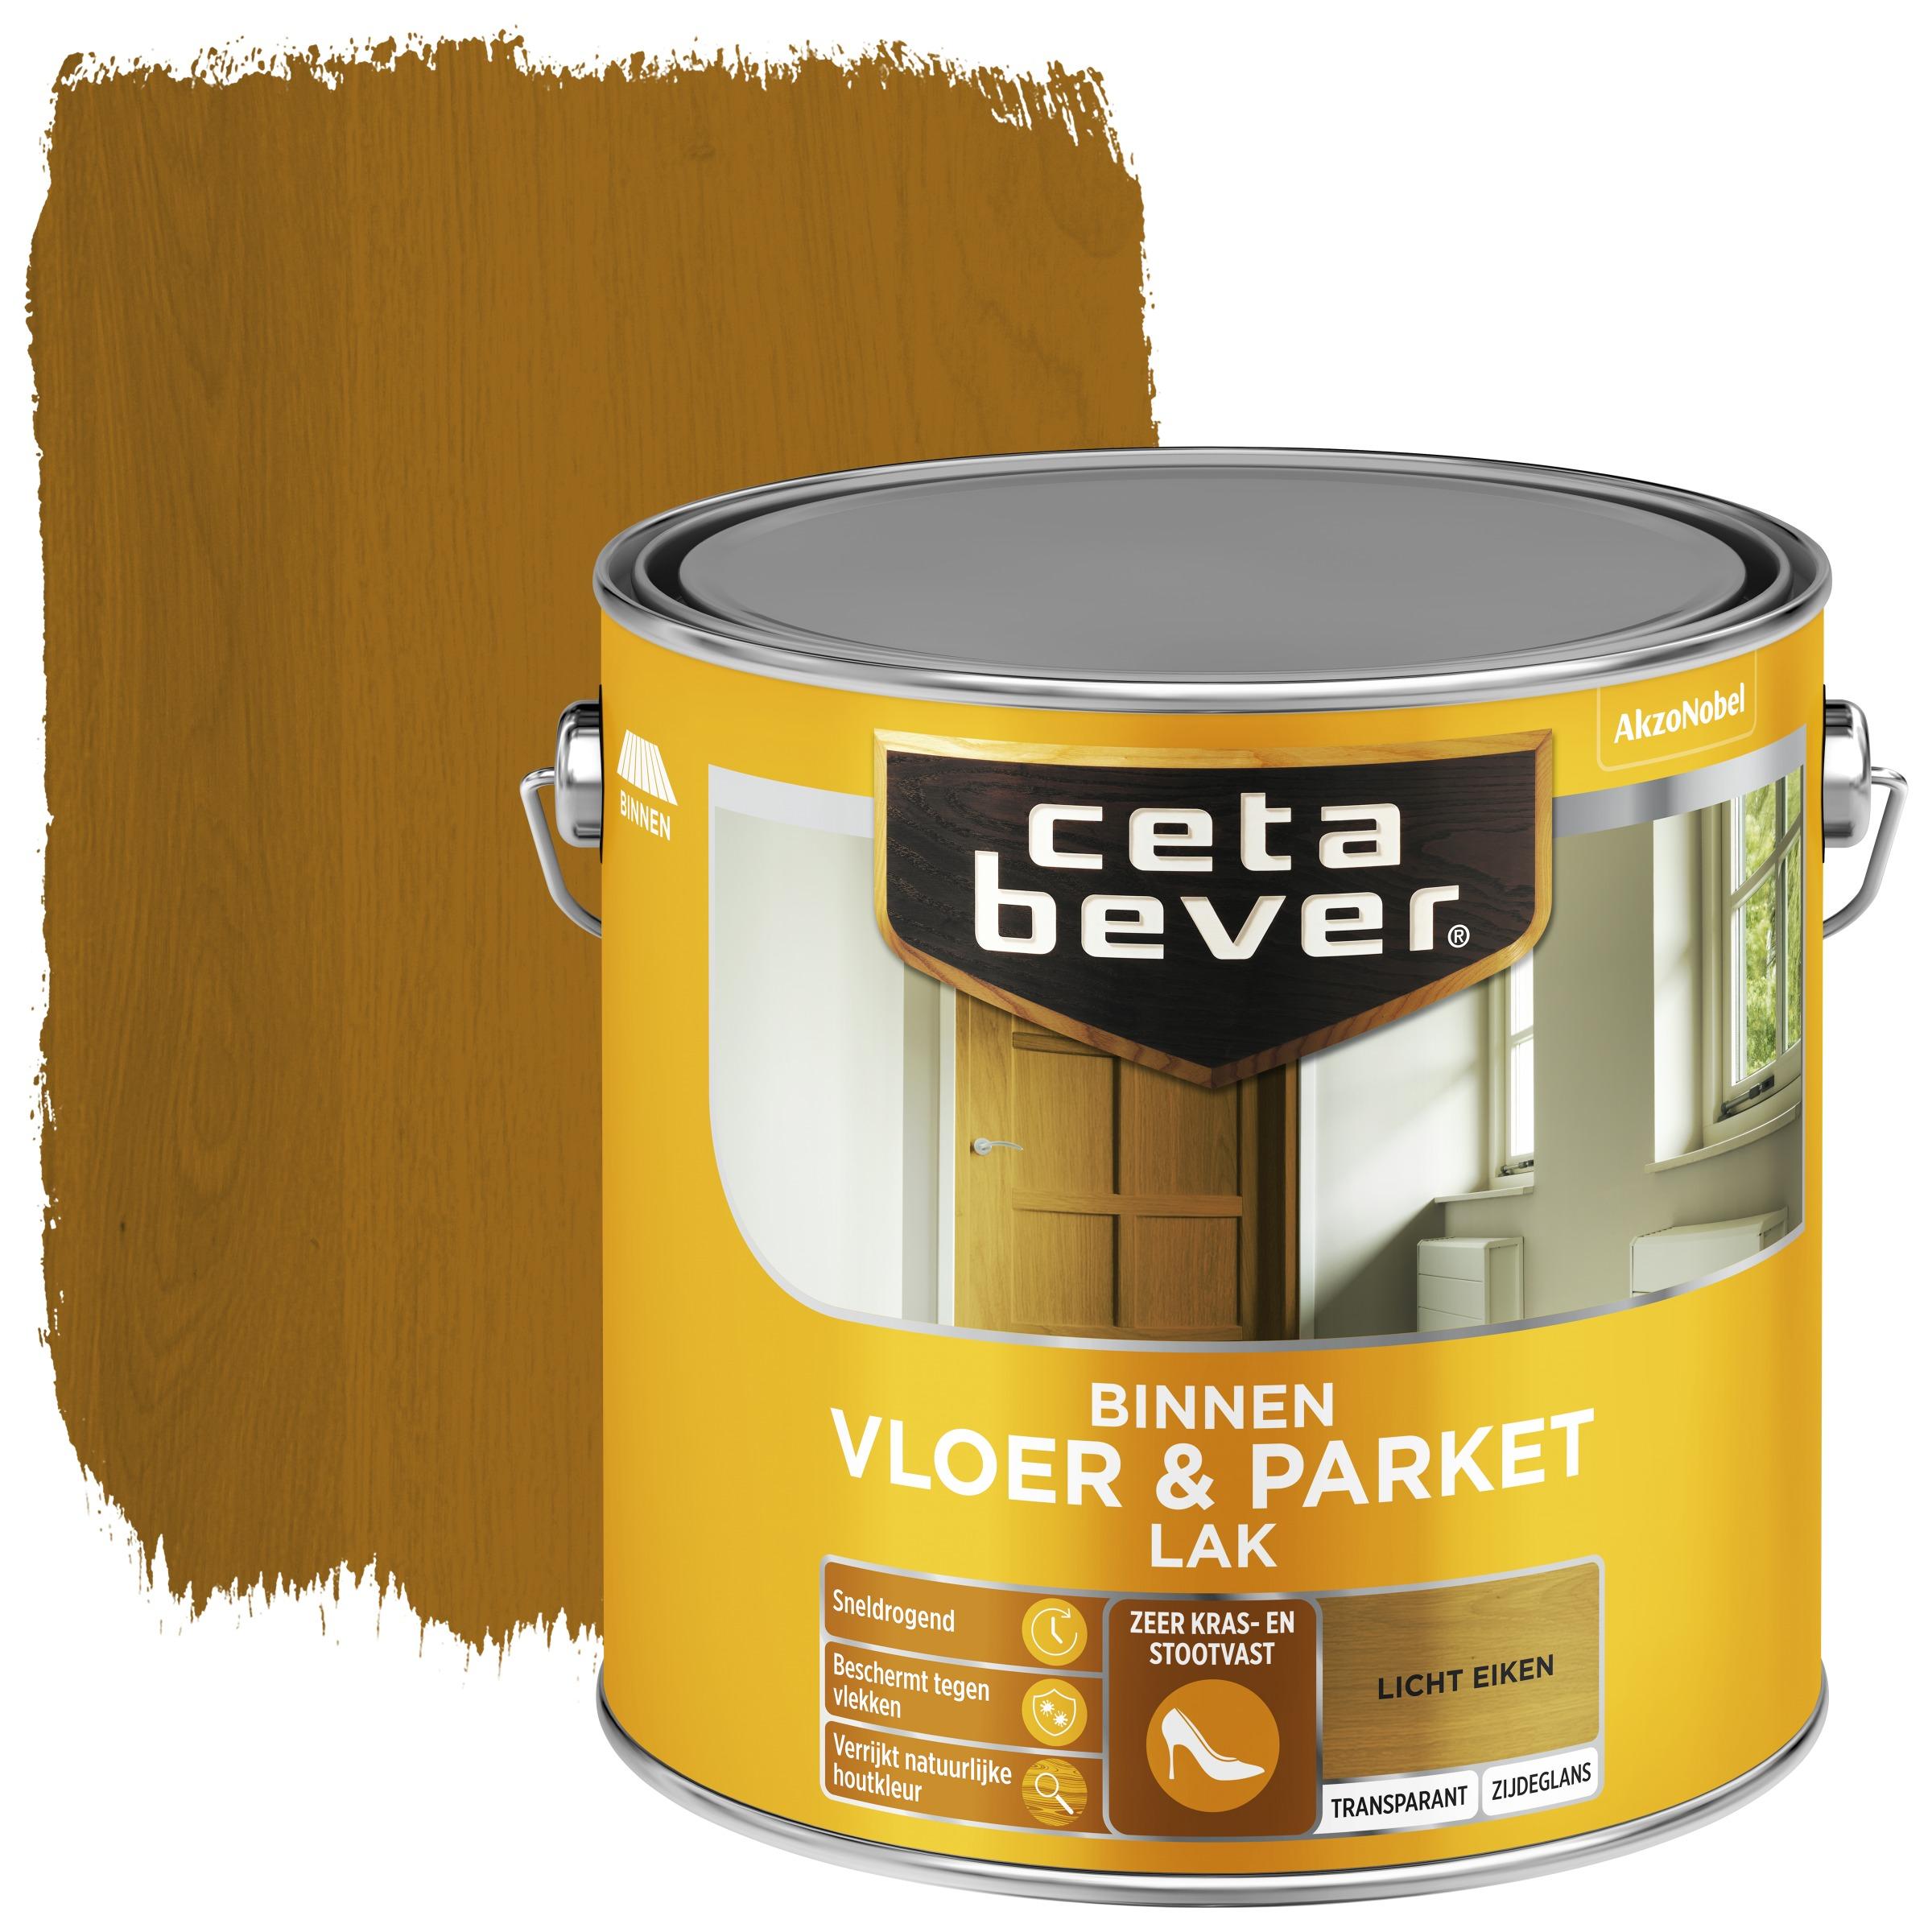 CetaBever vloer & parketlak ac 0106 licht eiken transparant 2,5l